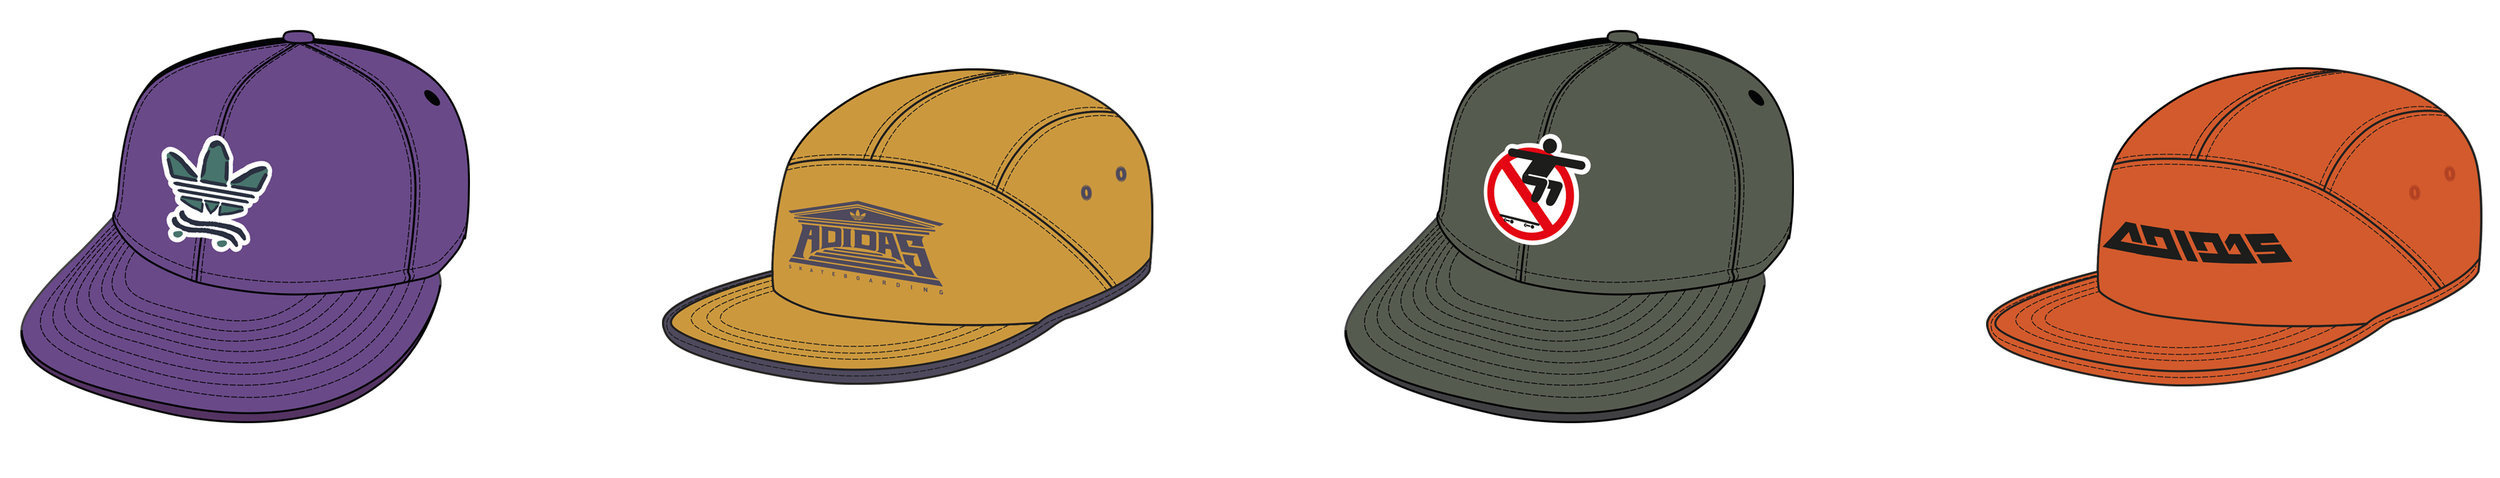 hat_01.jpg